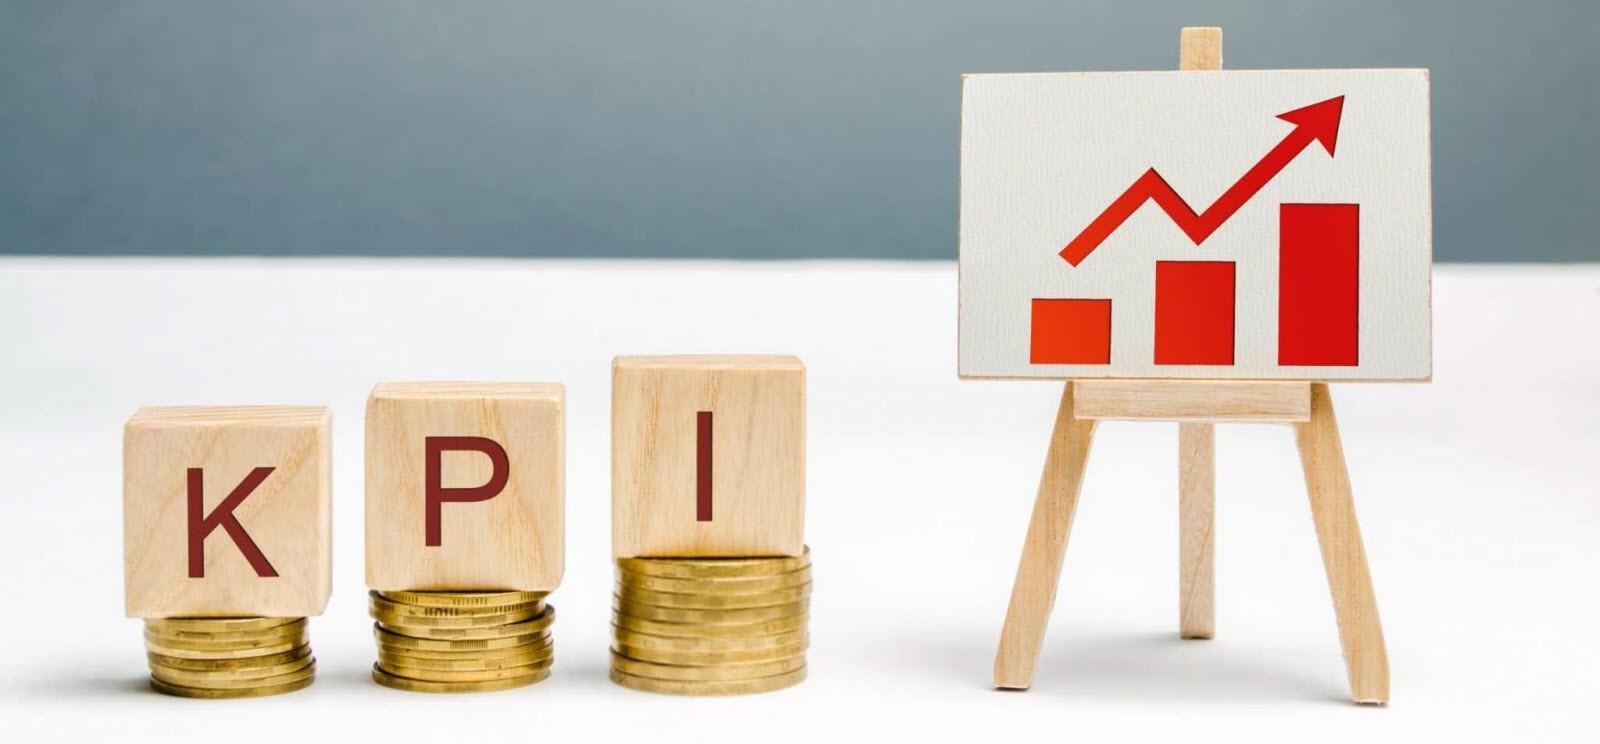 How to Measure Your Partner Program KPIs